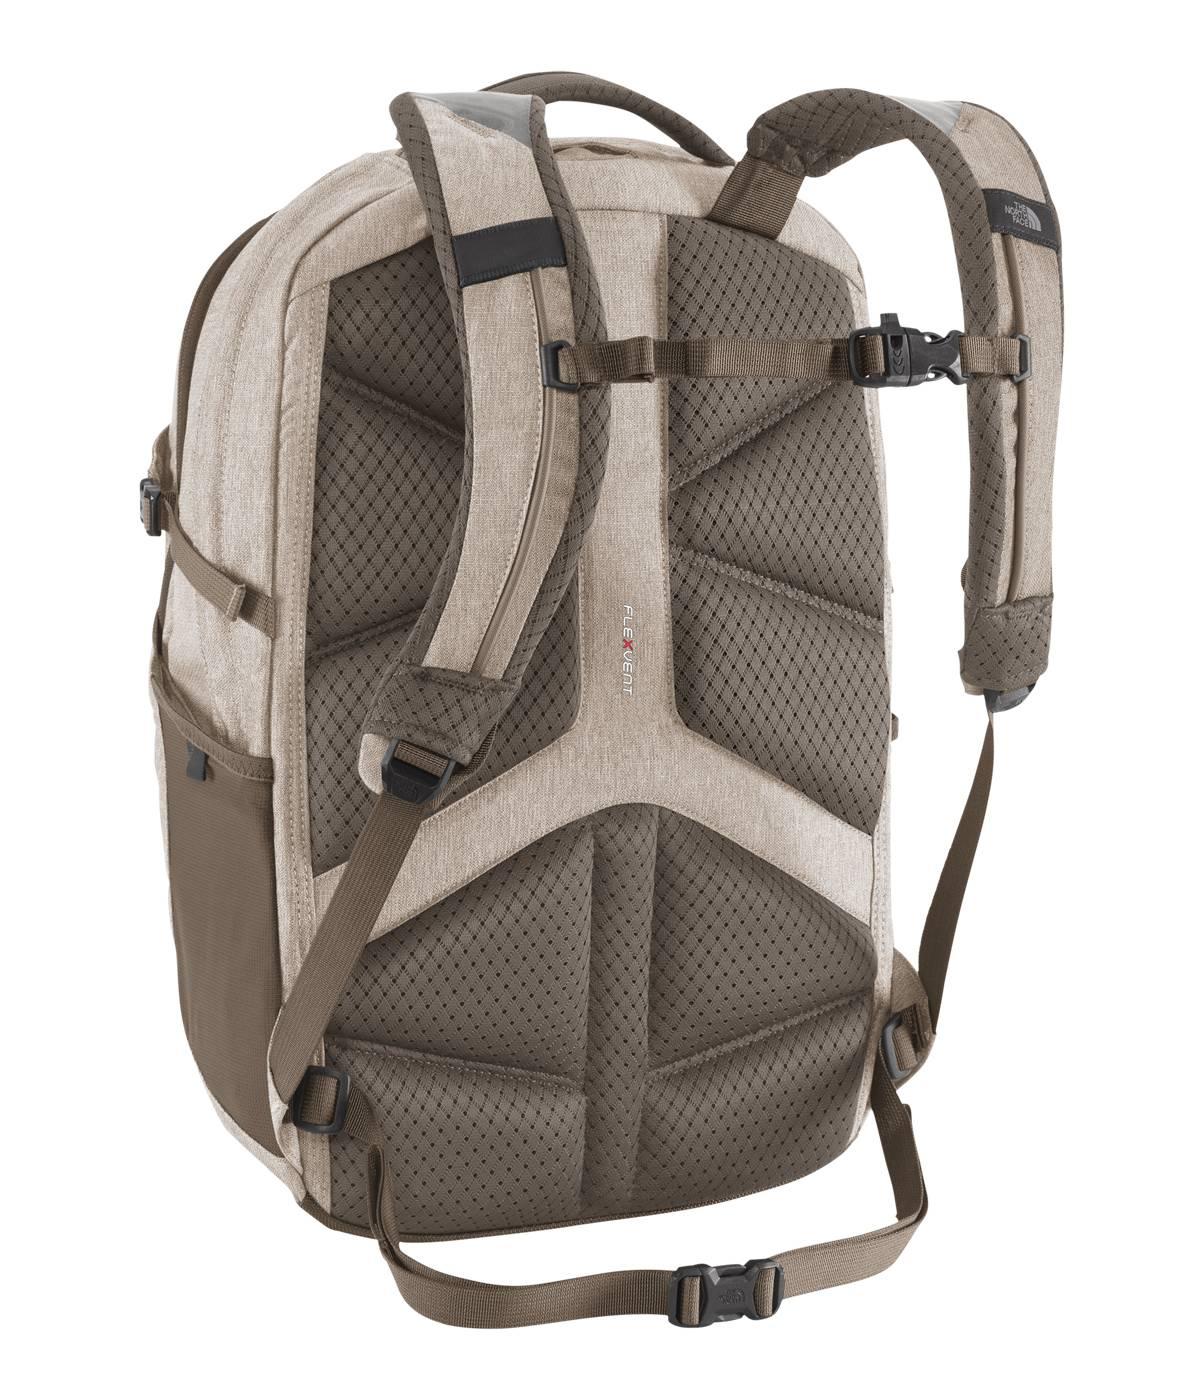 Model Women-39-s-borealis-backpack-A93F_YG0_hero | Pioneers Board Shop